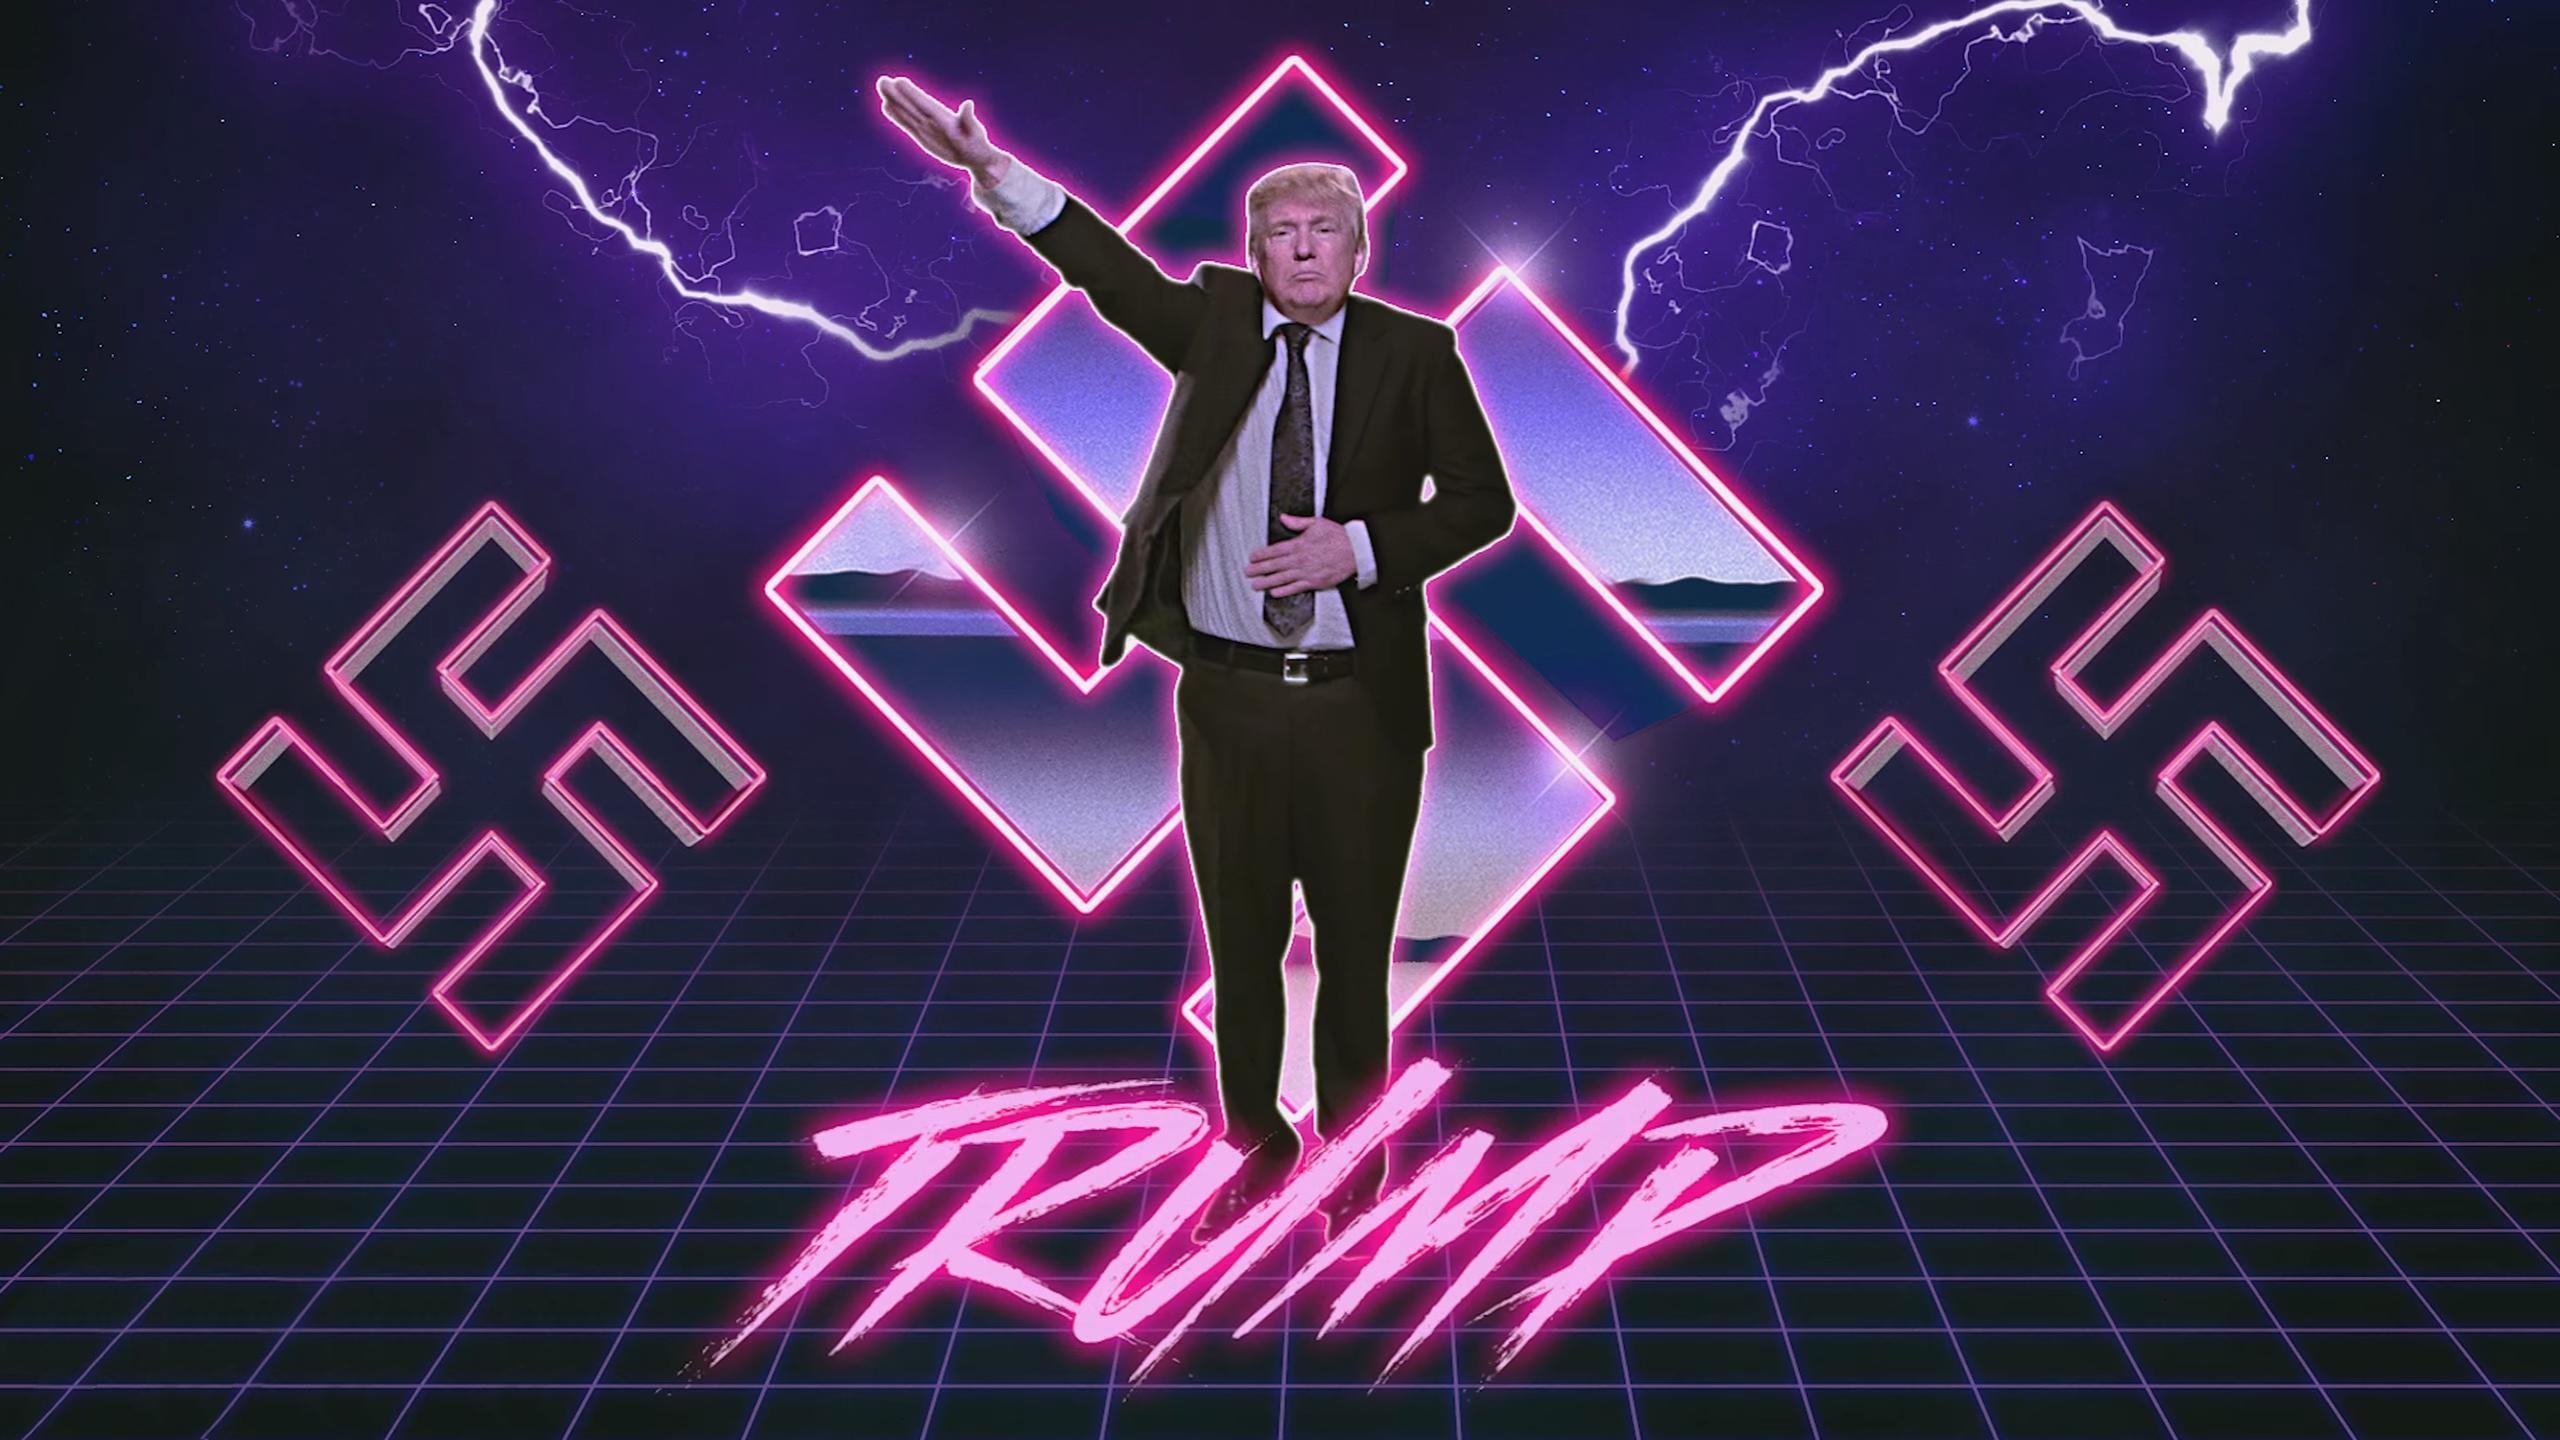 2560x1440 Trump wallpapers in 1440p - original from Mike Divas https://youtu.